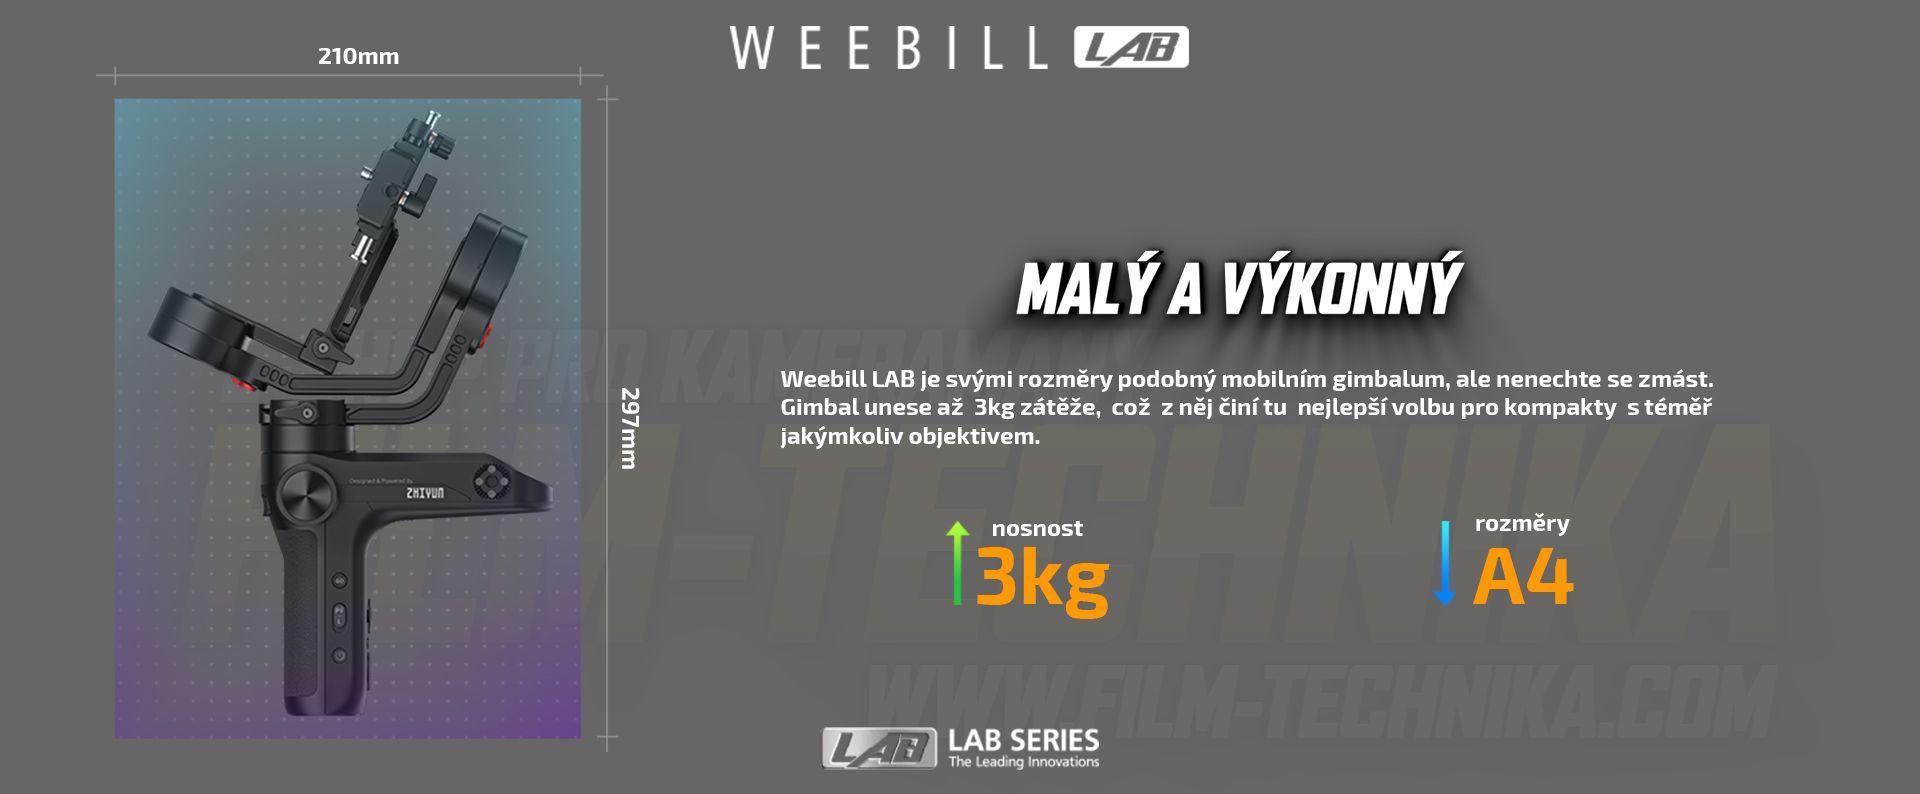 film-technika-zhiyun-weebill-lab-intext10